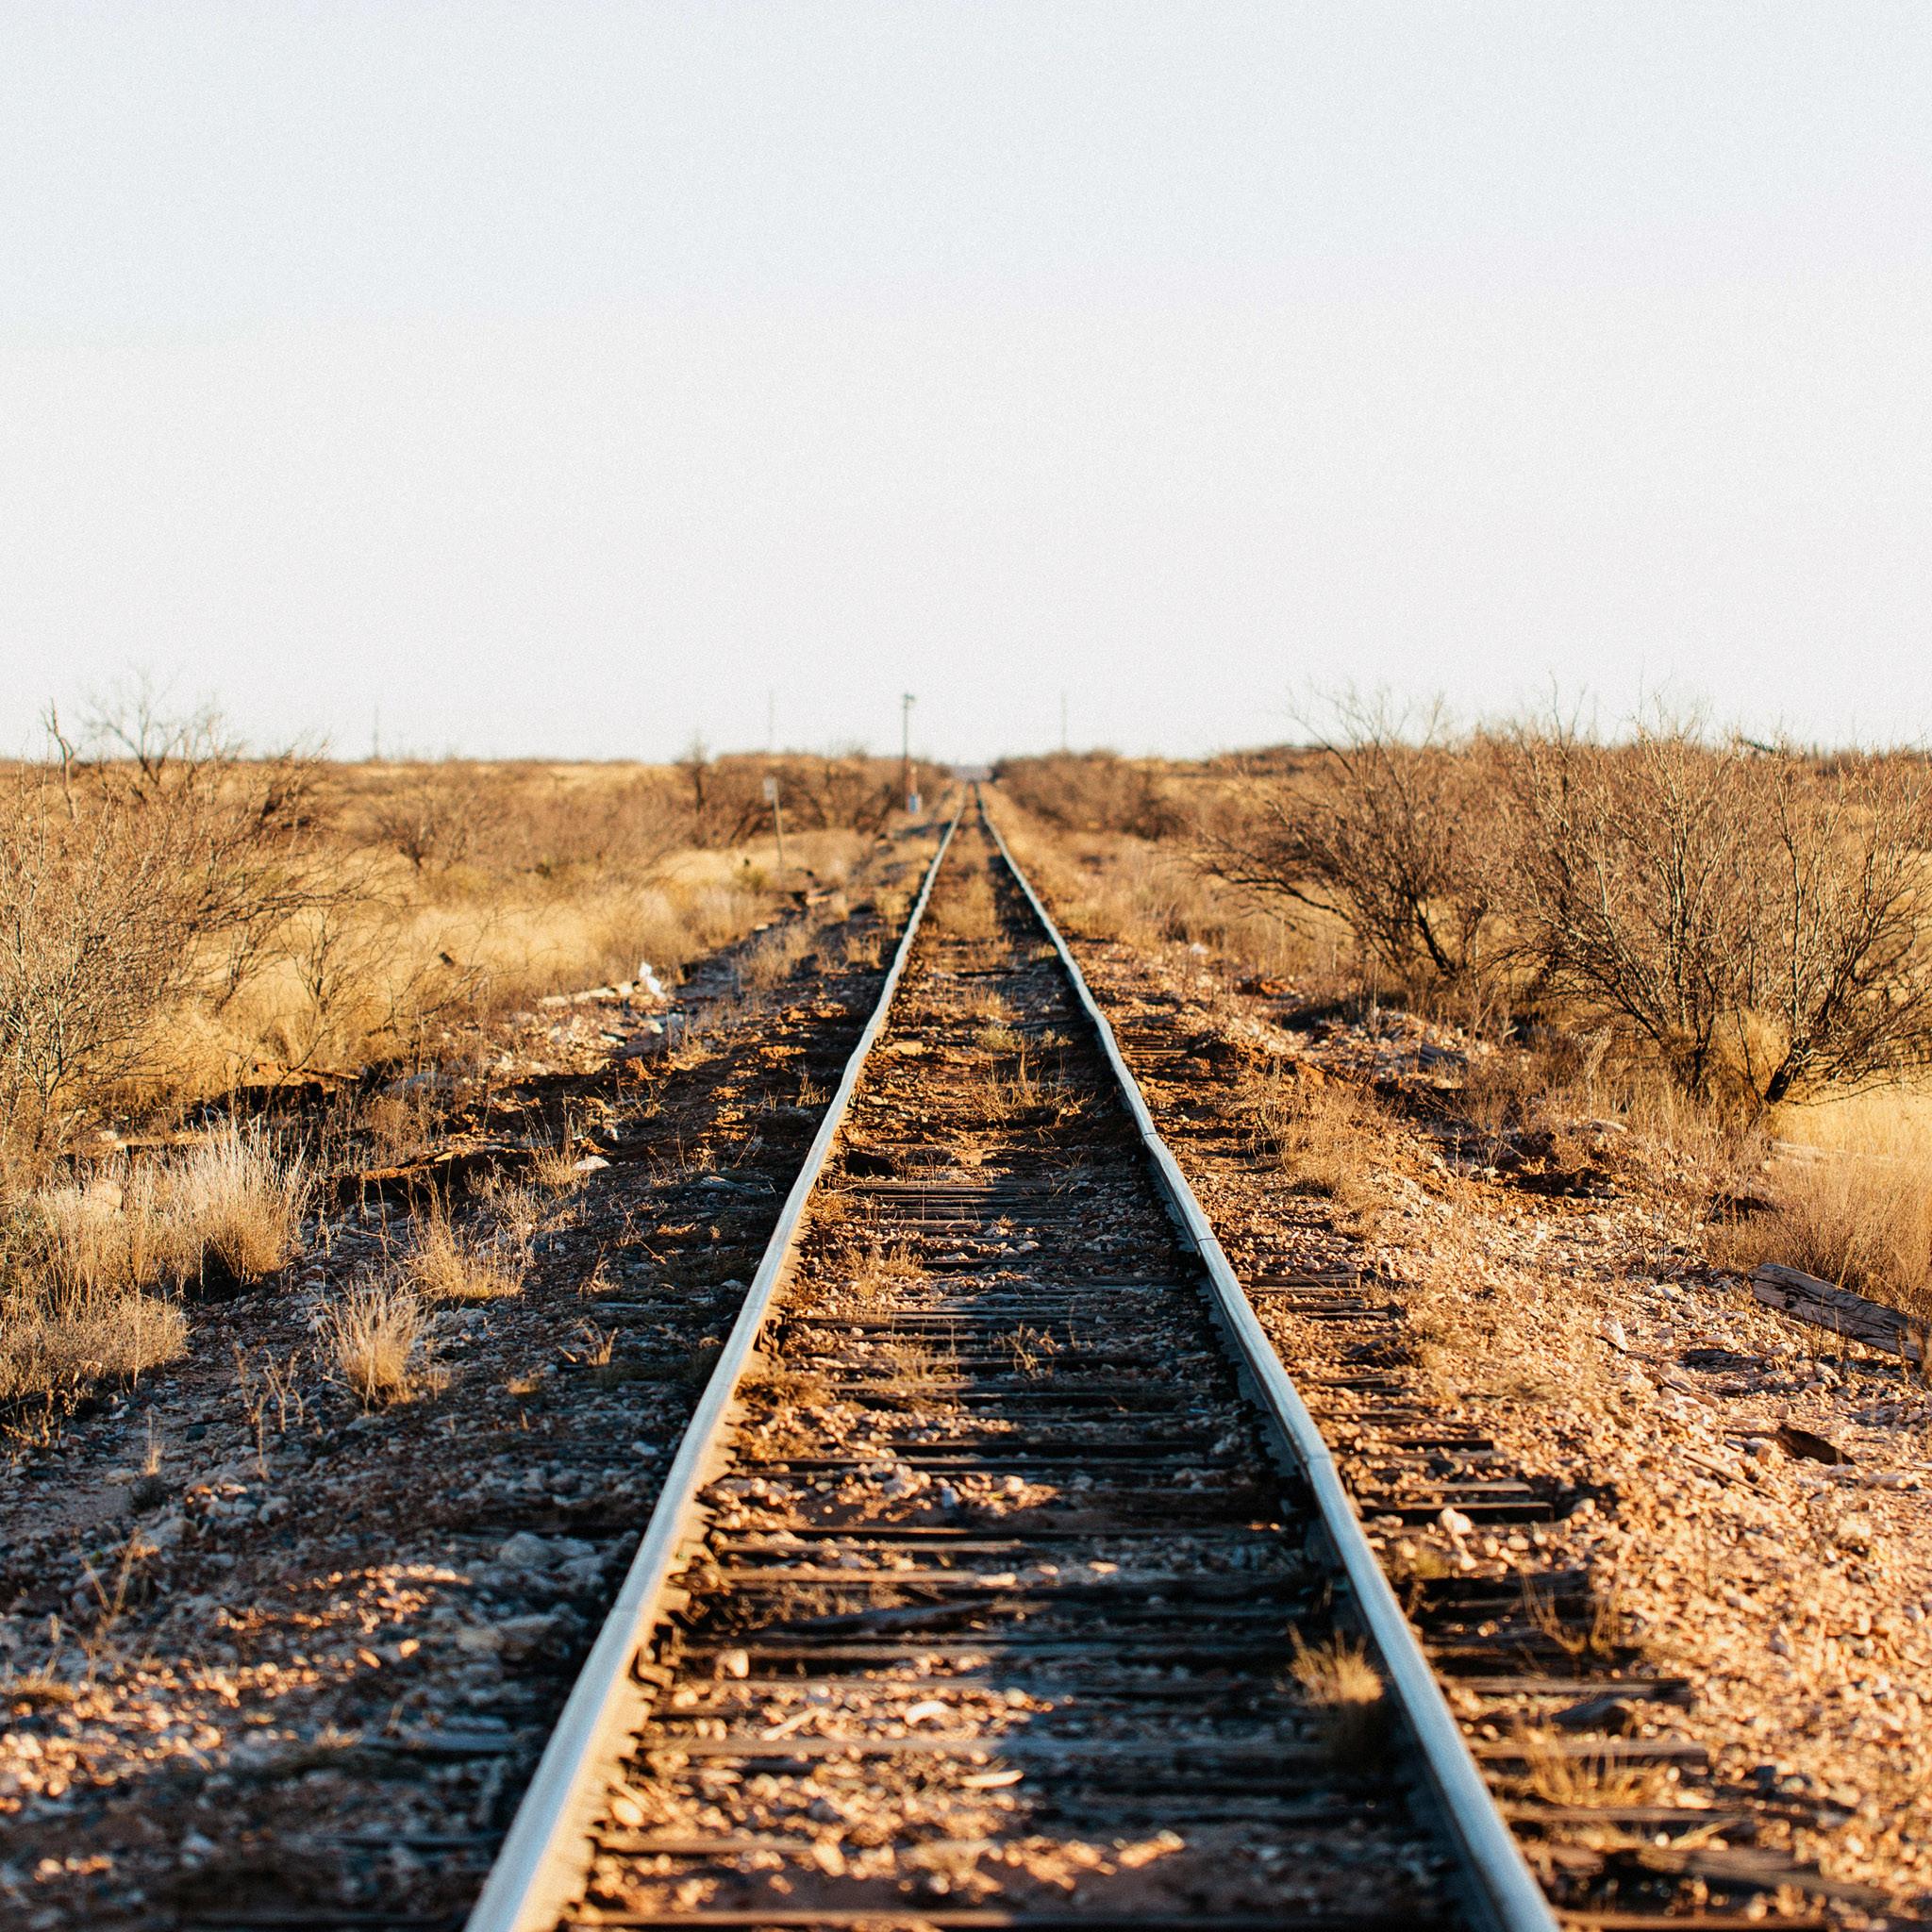 charles henry – train track ipad wallpaper